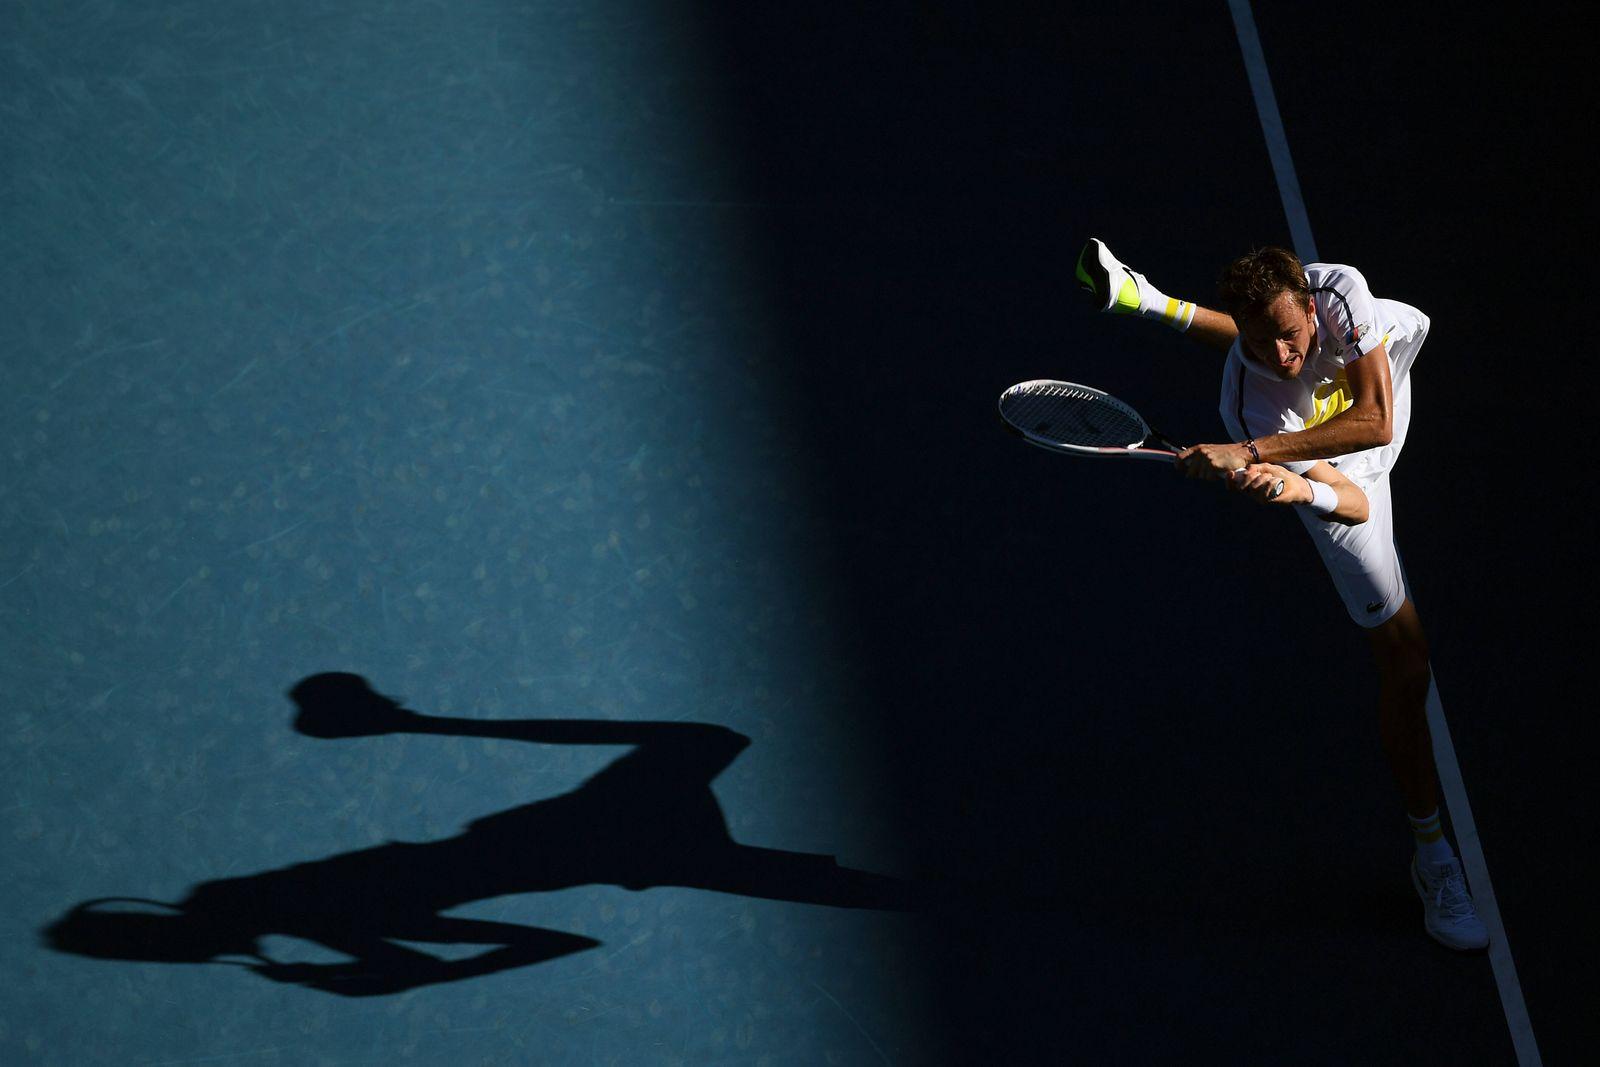 Sport Bilder des Tages TENNIS AUSTRALIAN OPEN, Daniil Medvedev of Russia in action during his Quarterfinals Men s single